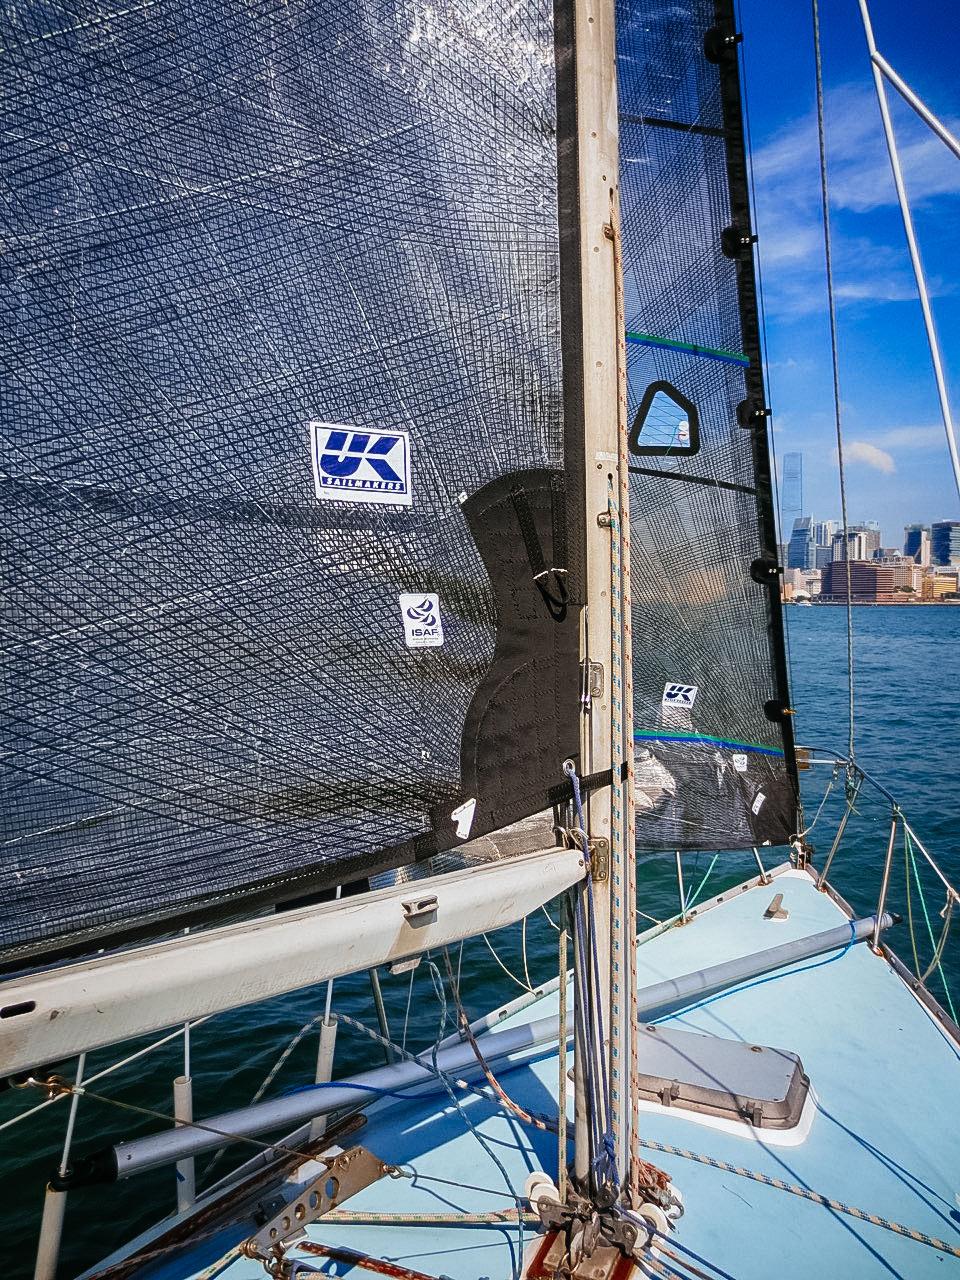 X-Drive carbon mainsail and genoa.